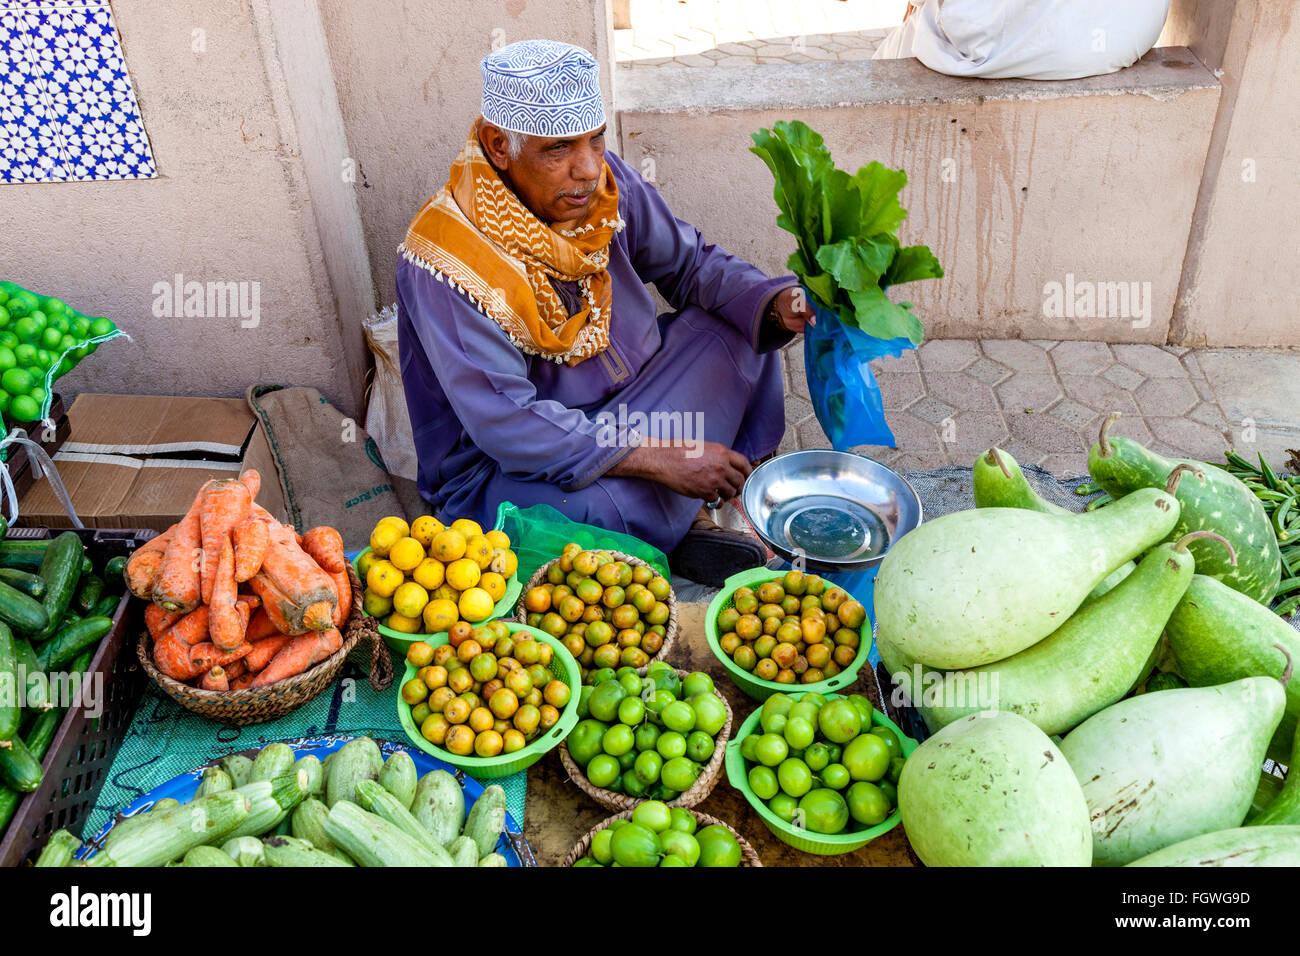 Obst- und Gemüsemarkt in Nizwa Souk, Nizwa, Ad Dakhiliyah Region, Oman Stockbild